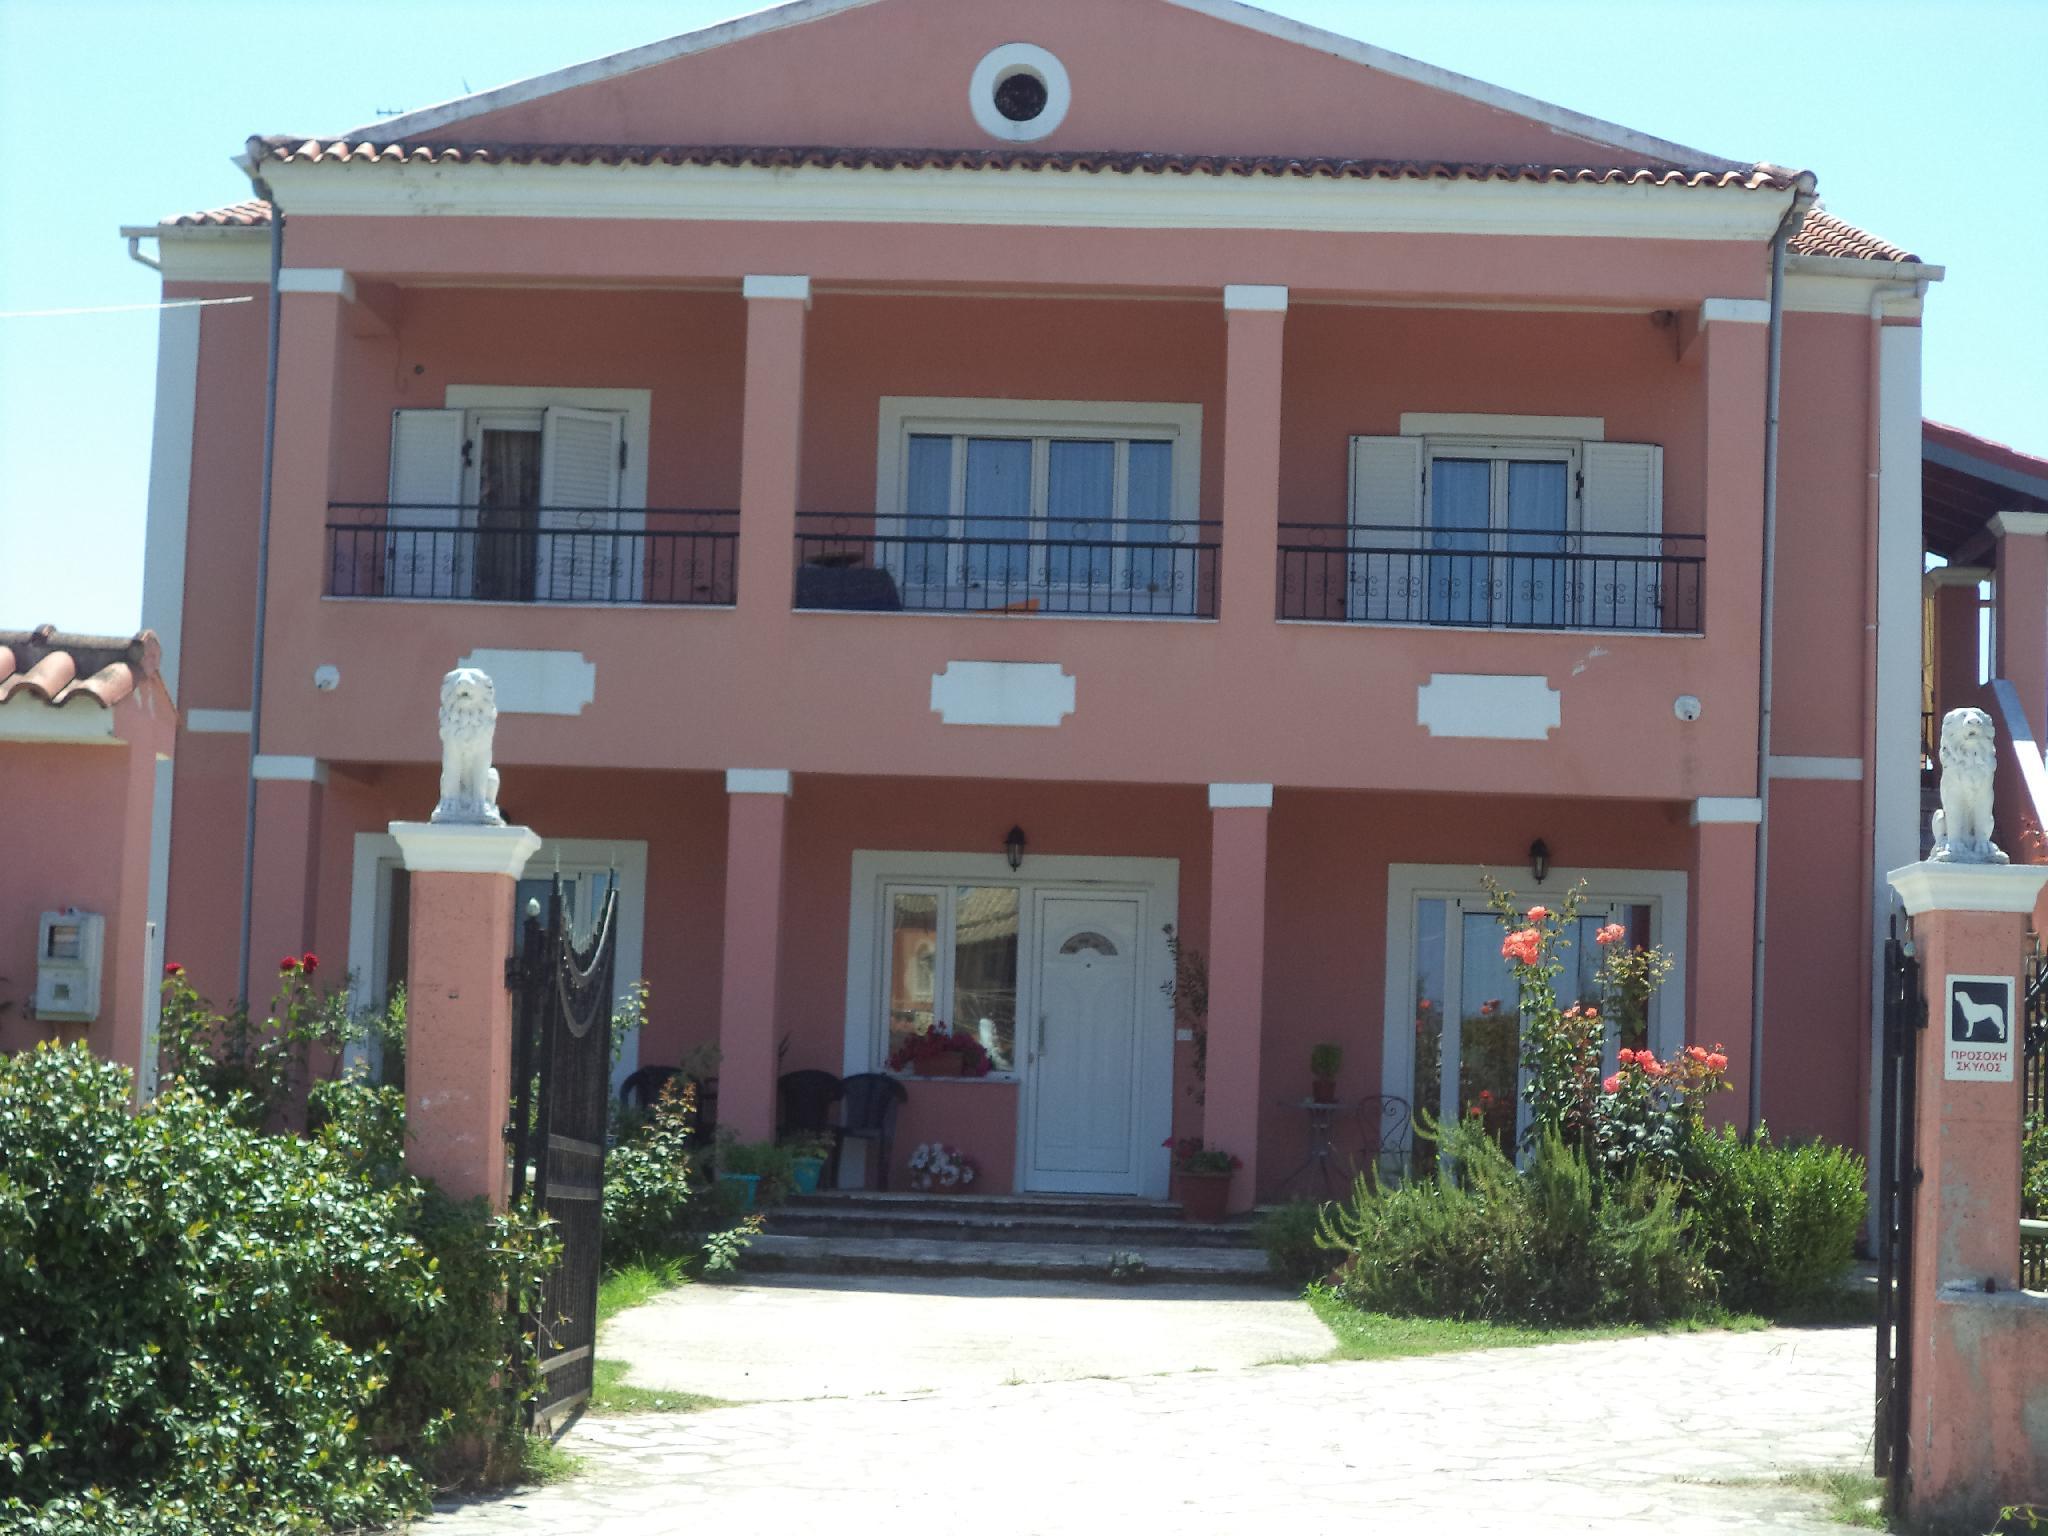 KAROUBIS COUNTRY HOUSE IN CORFU